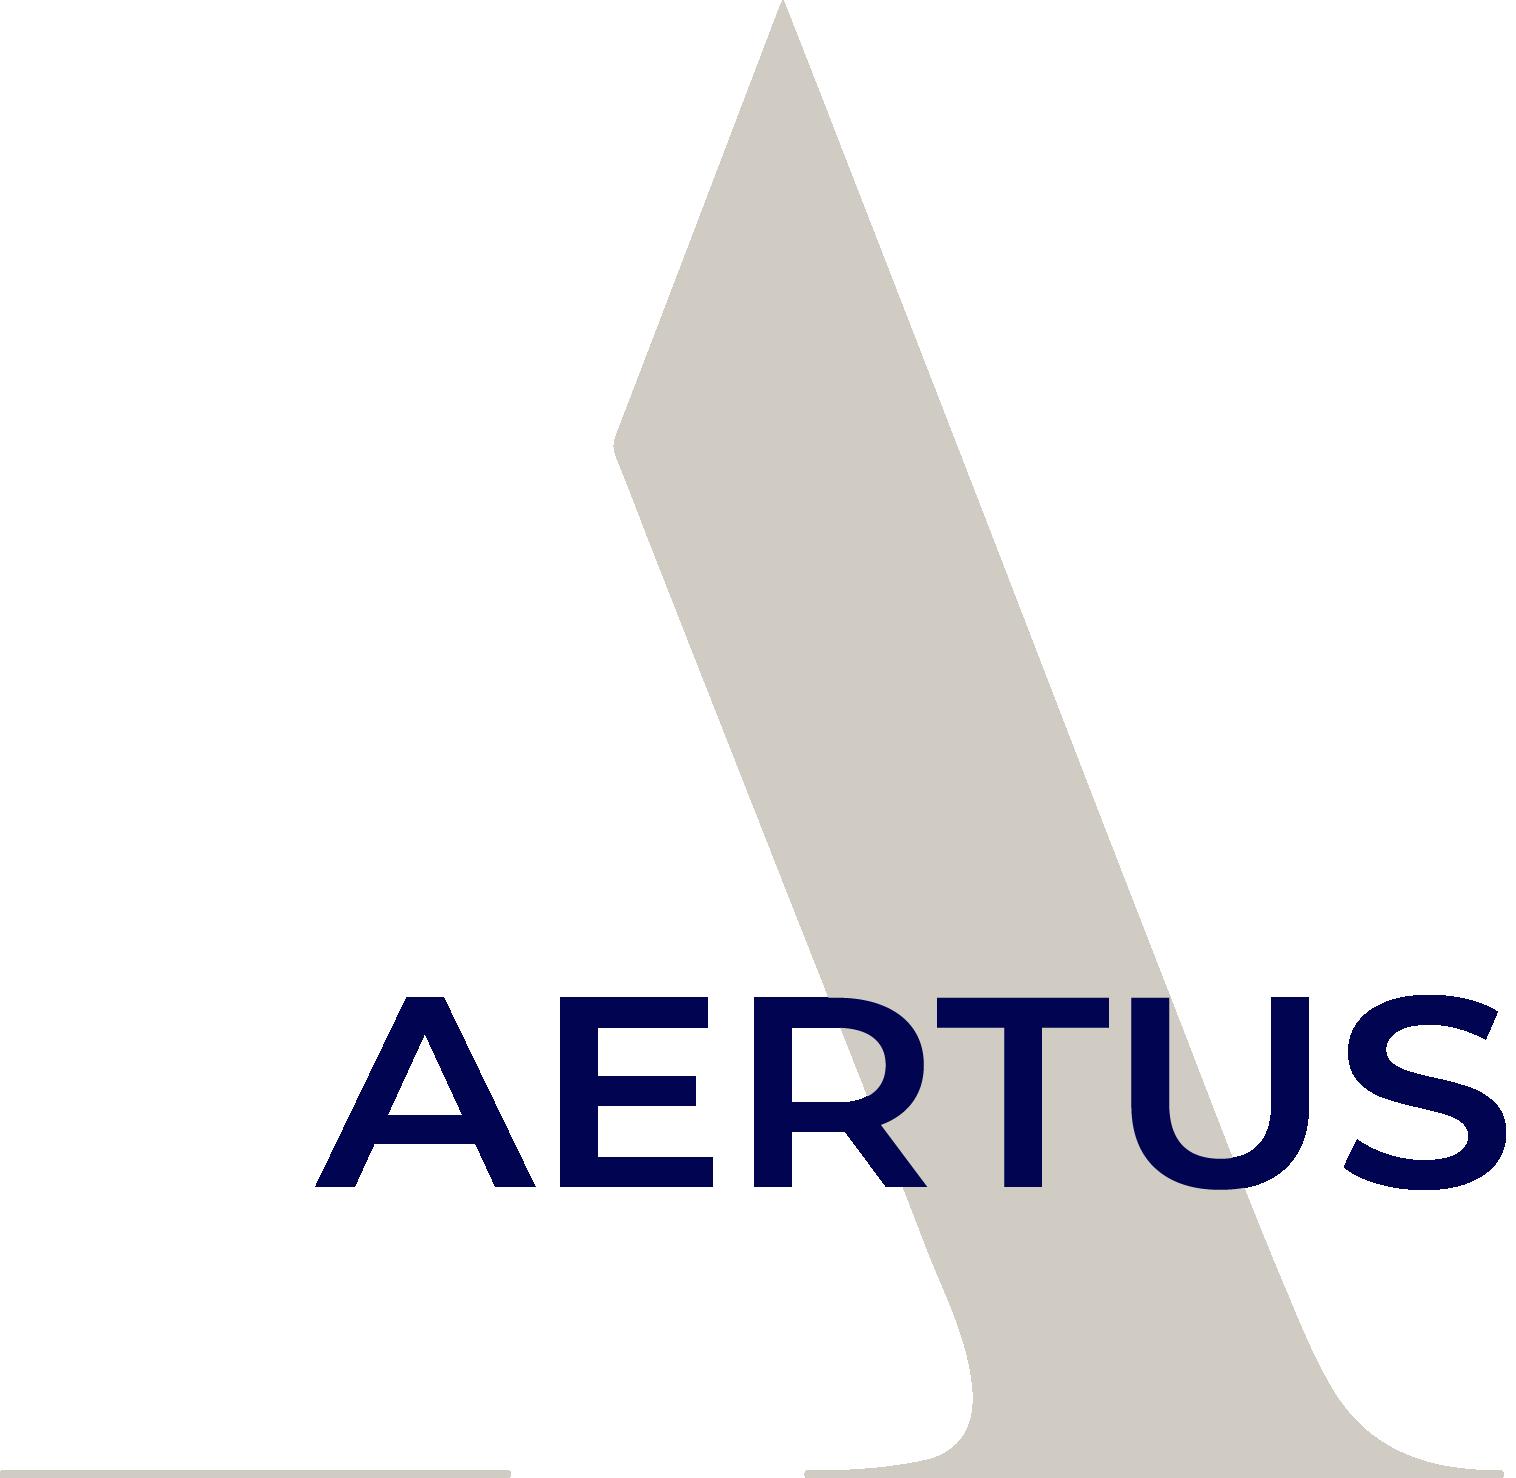 Aertus Finance